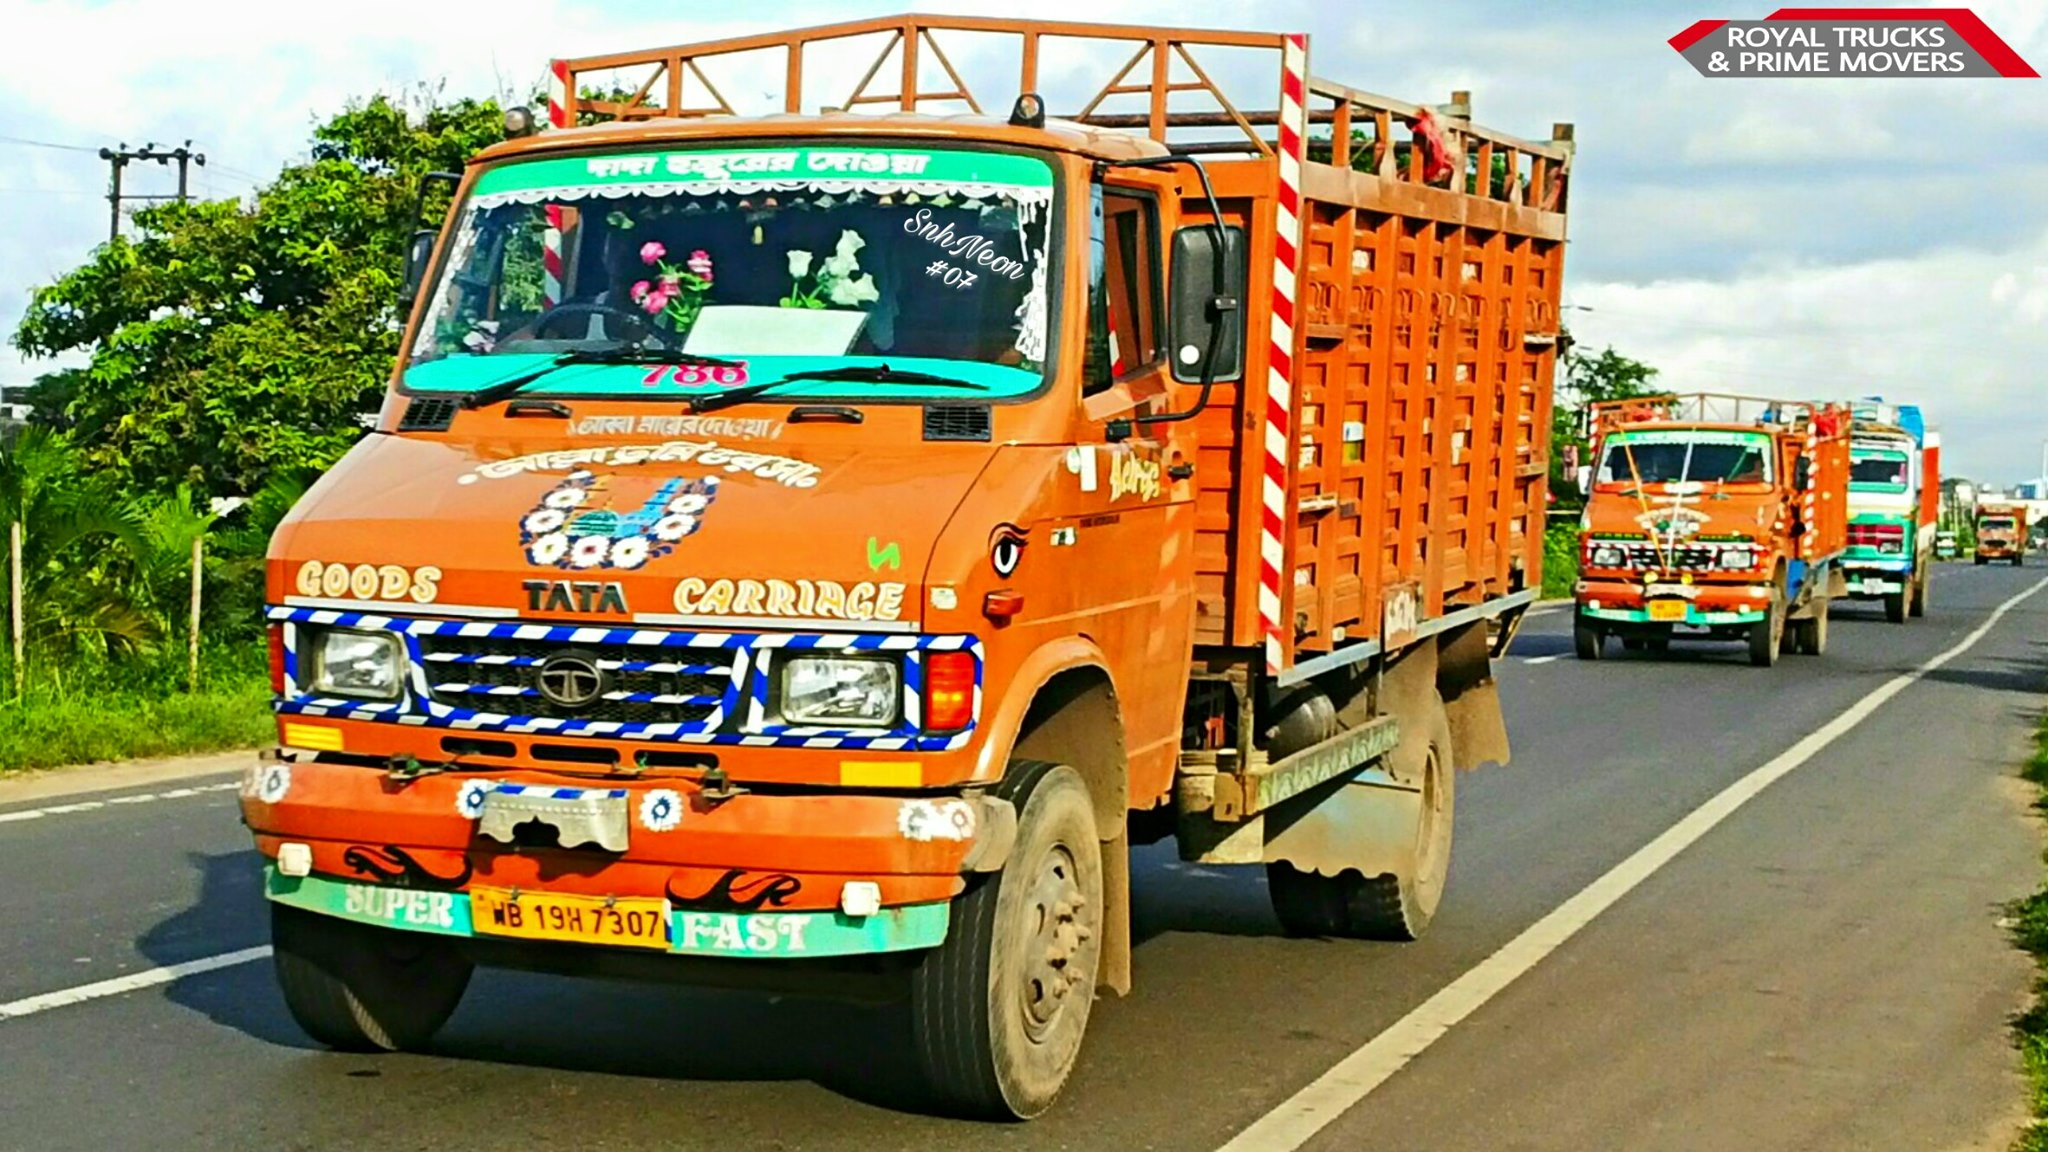 Tata-SFC-709-CHAMPADANGA-DANKUNI-ROAD--HOOGHLY--WEST-BENGAL--INDIA